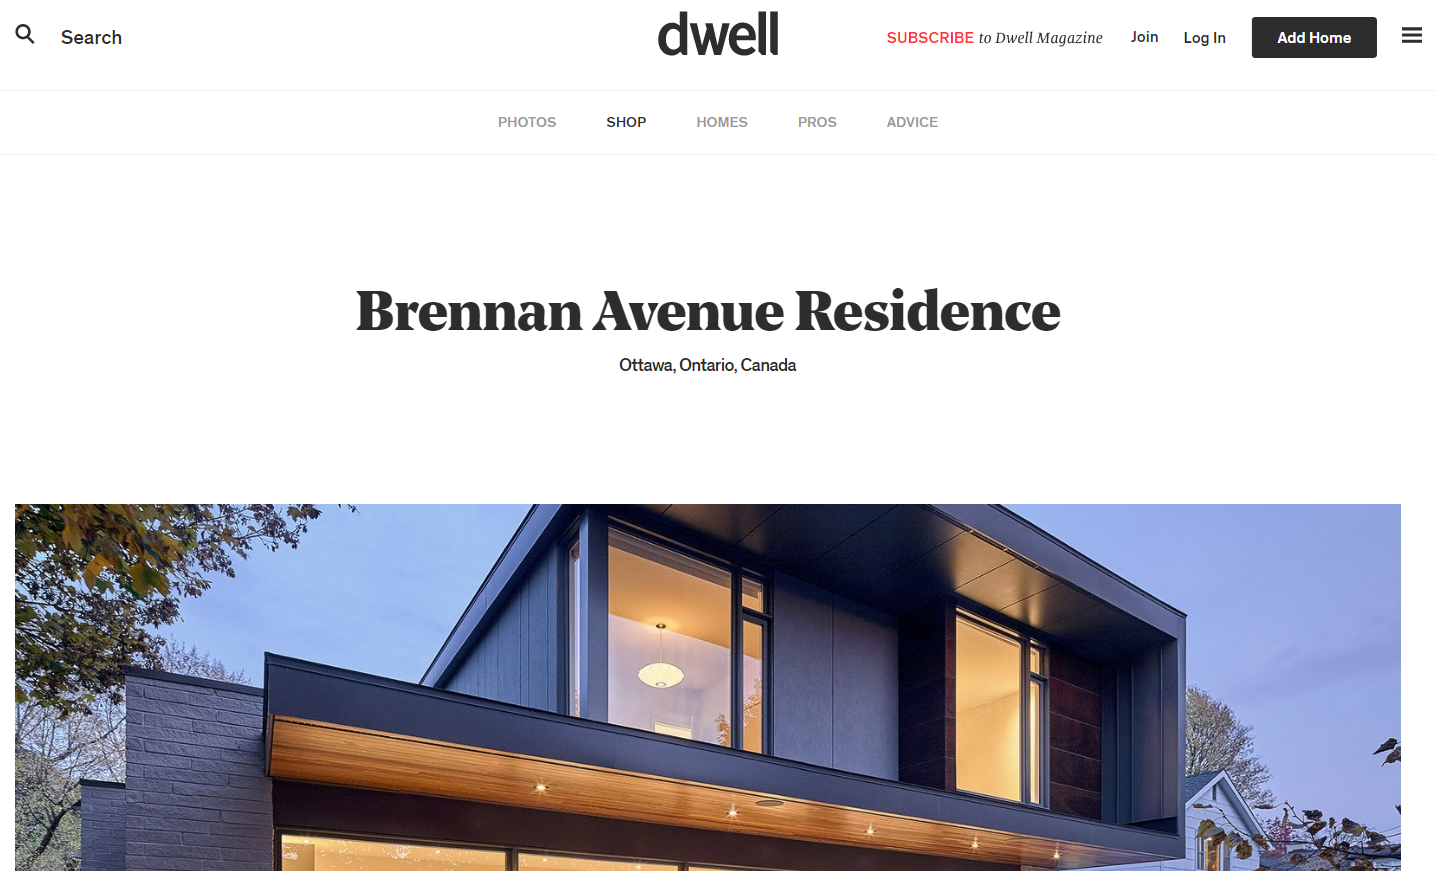 Project1 Brennan Dwell.PNG